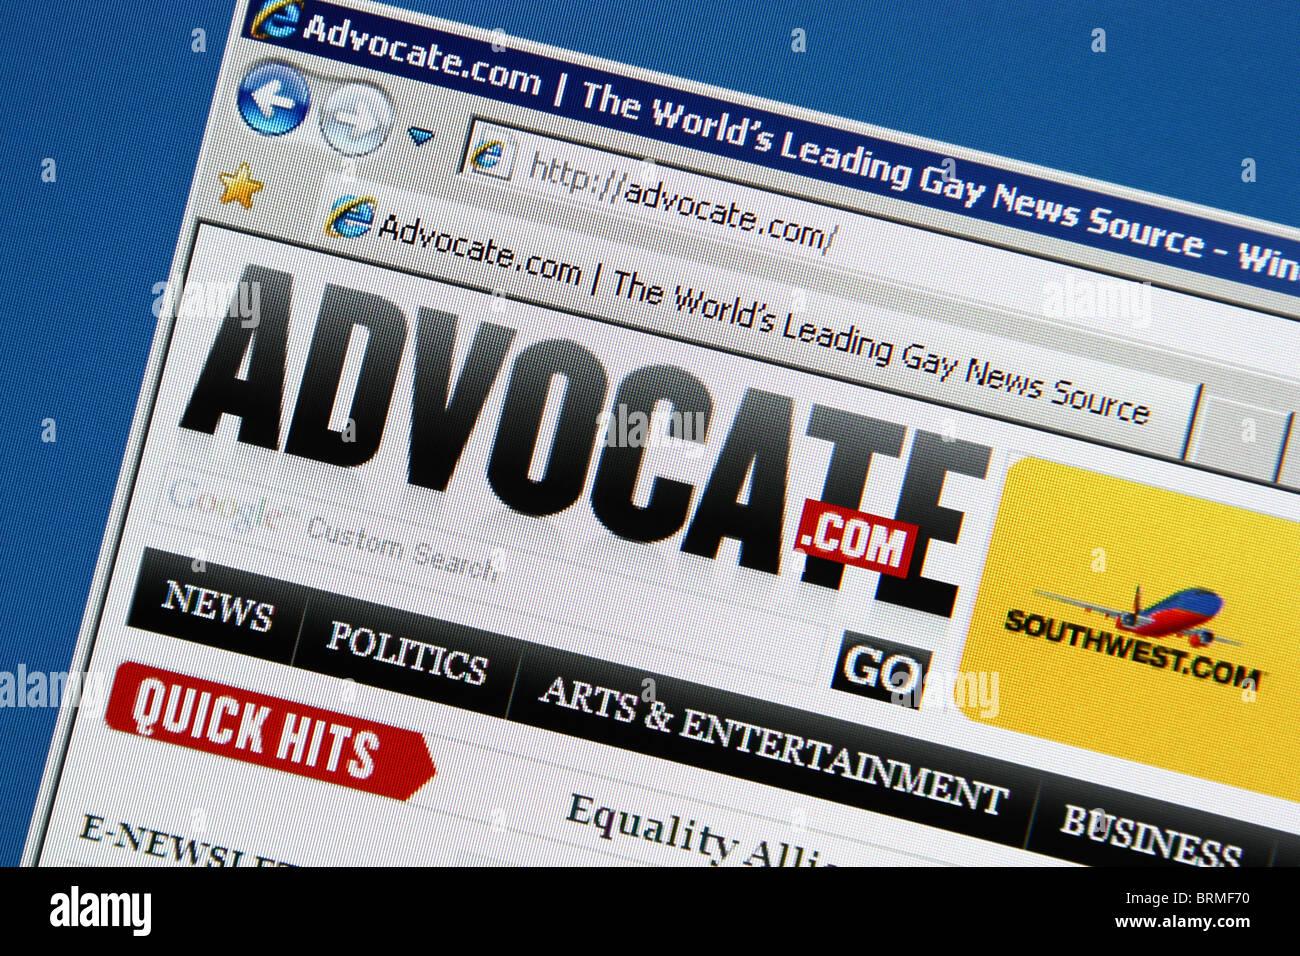 Gay news online